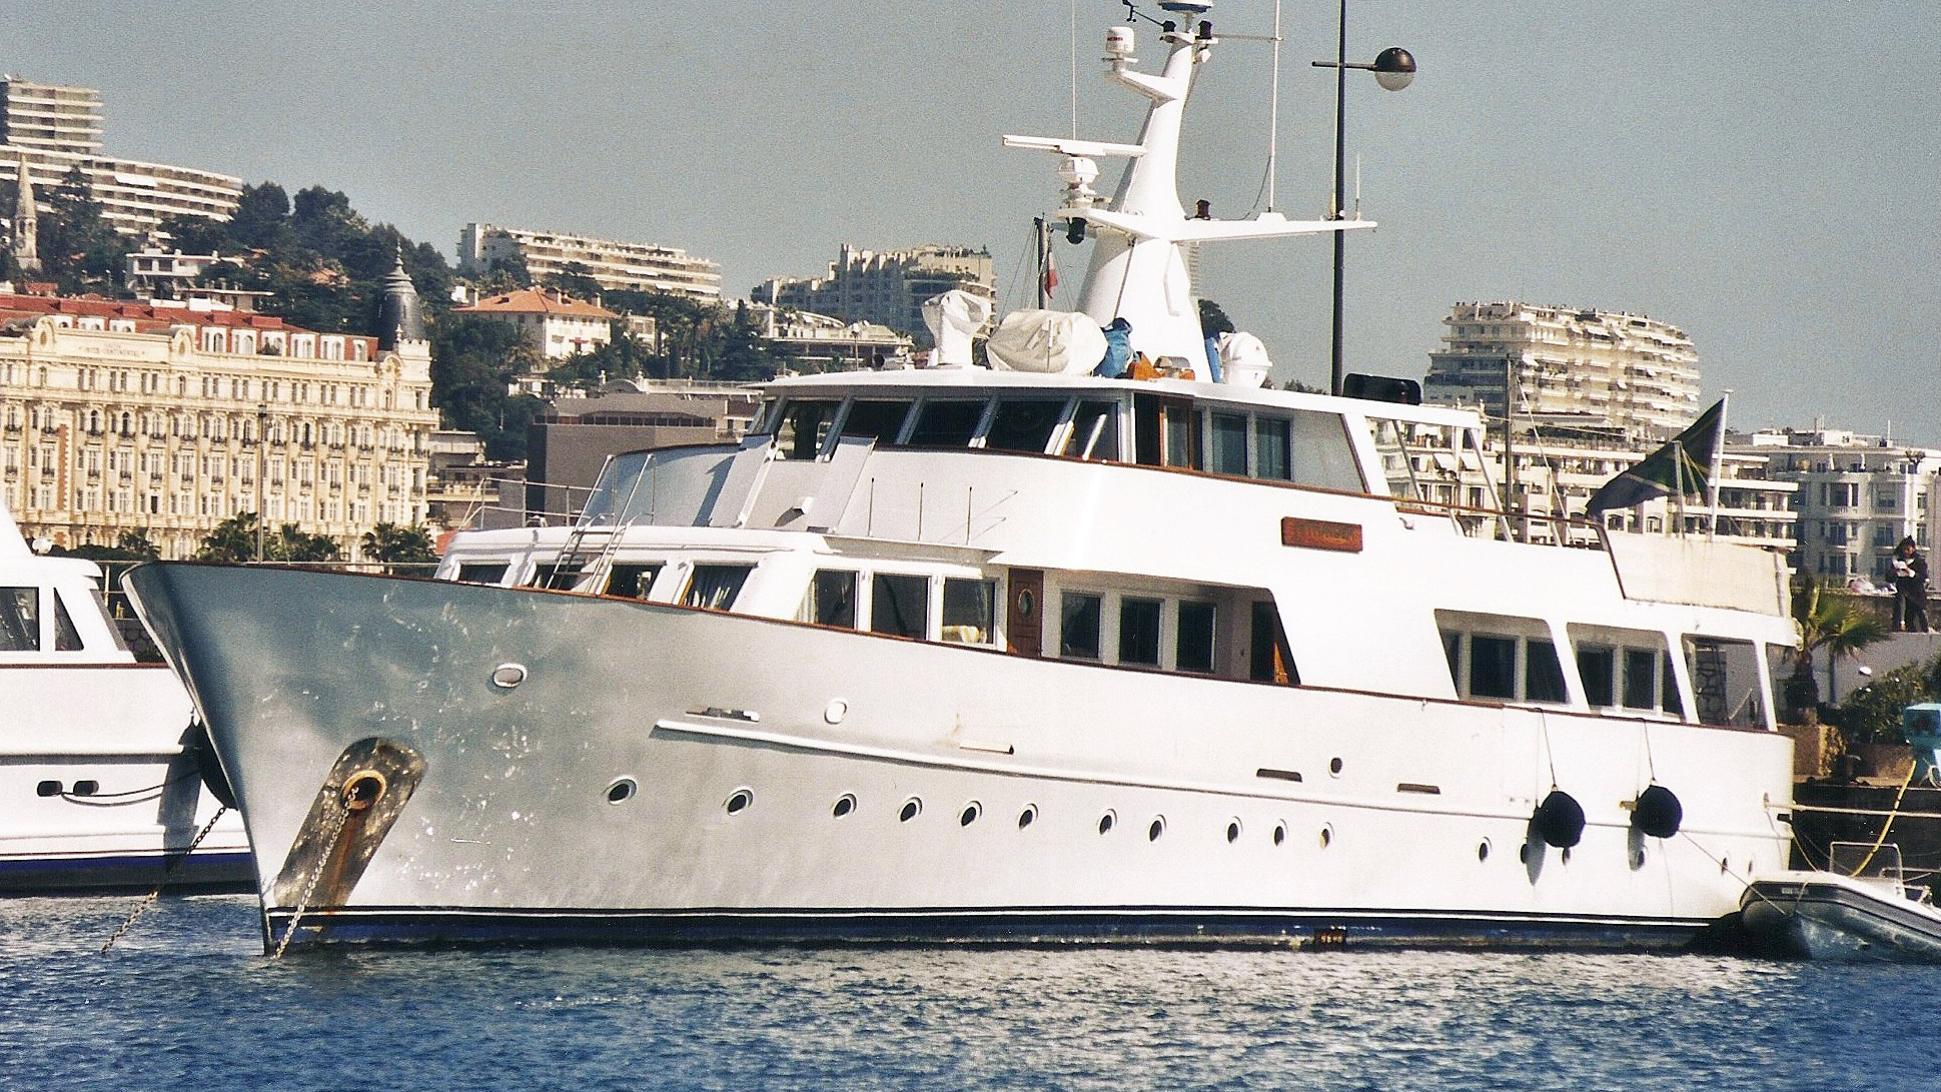 jackie-o-kiara-motor-yacht-secni-1967-33m-half-profile